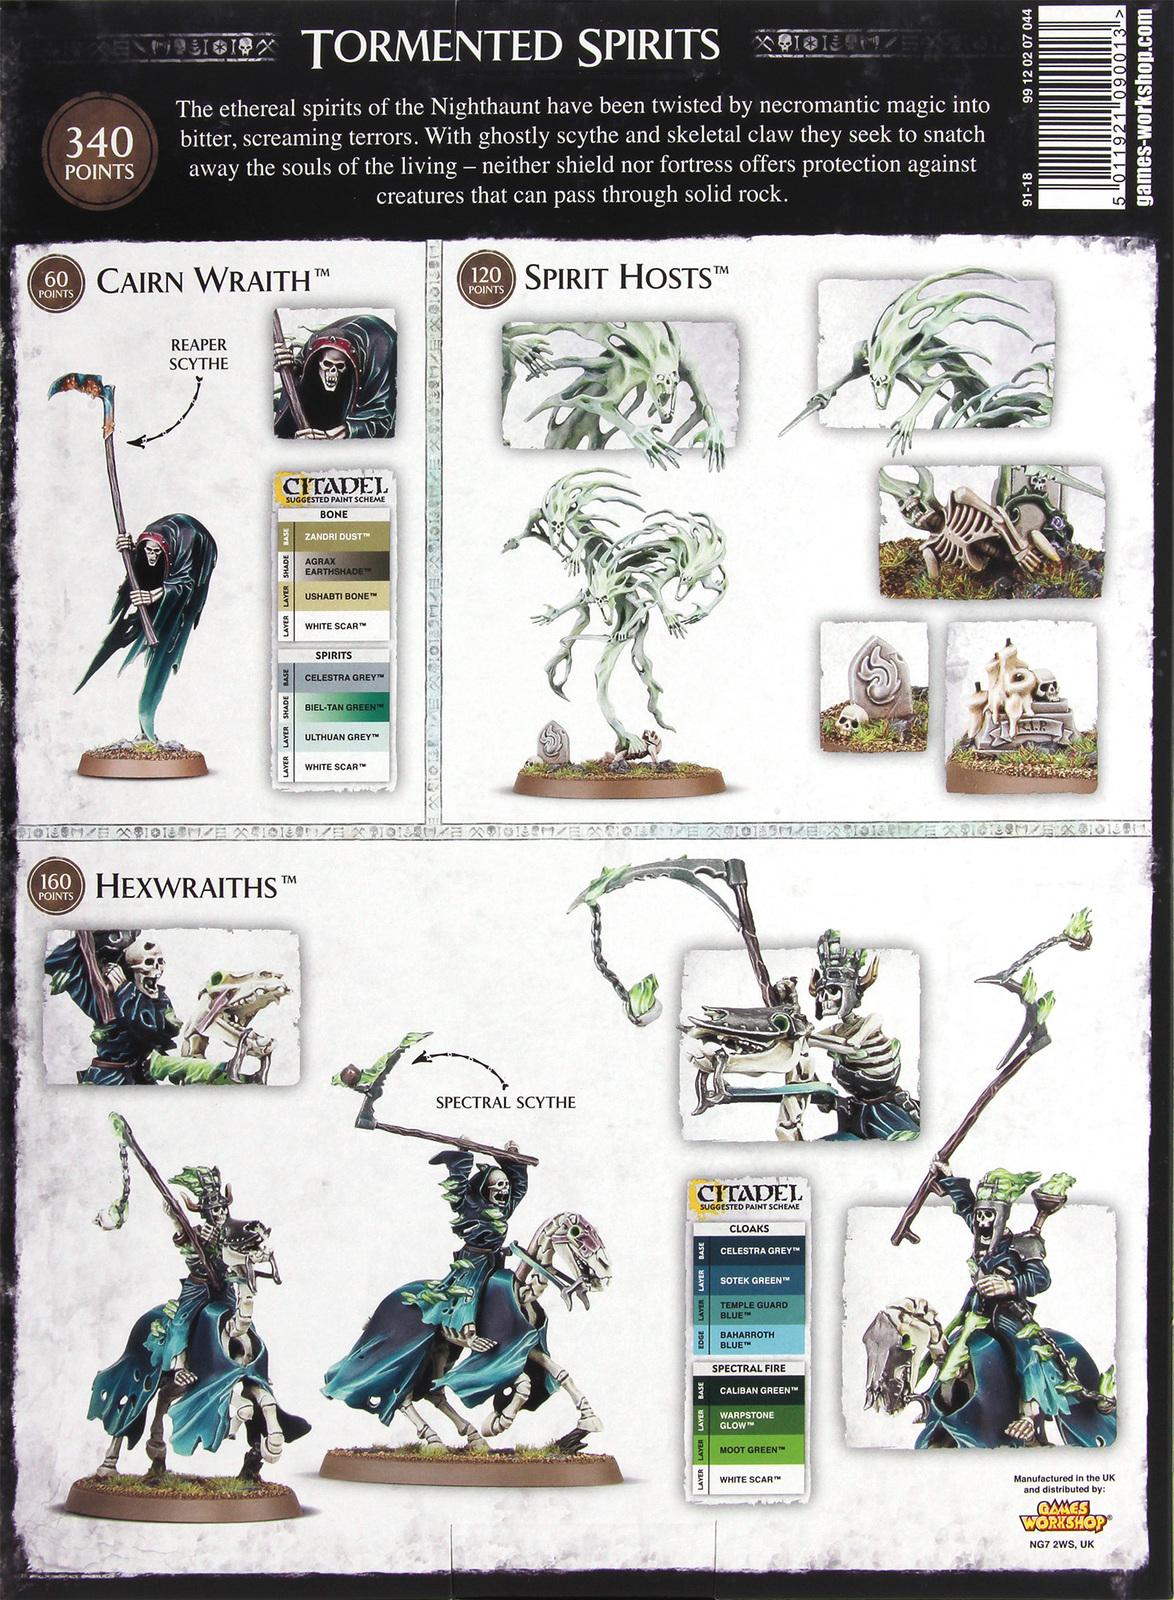 Warhammer Age of Sigmar: Nighthaunt Tormented Spirits image